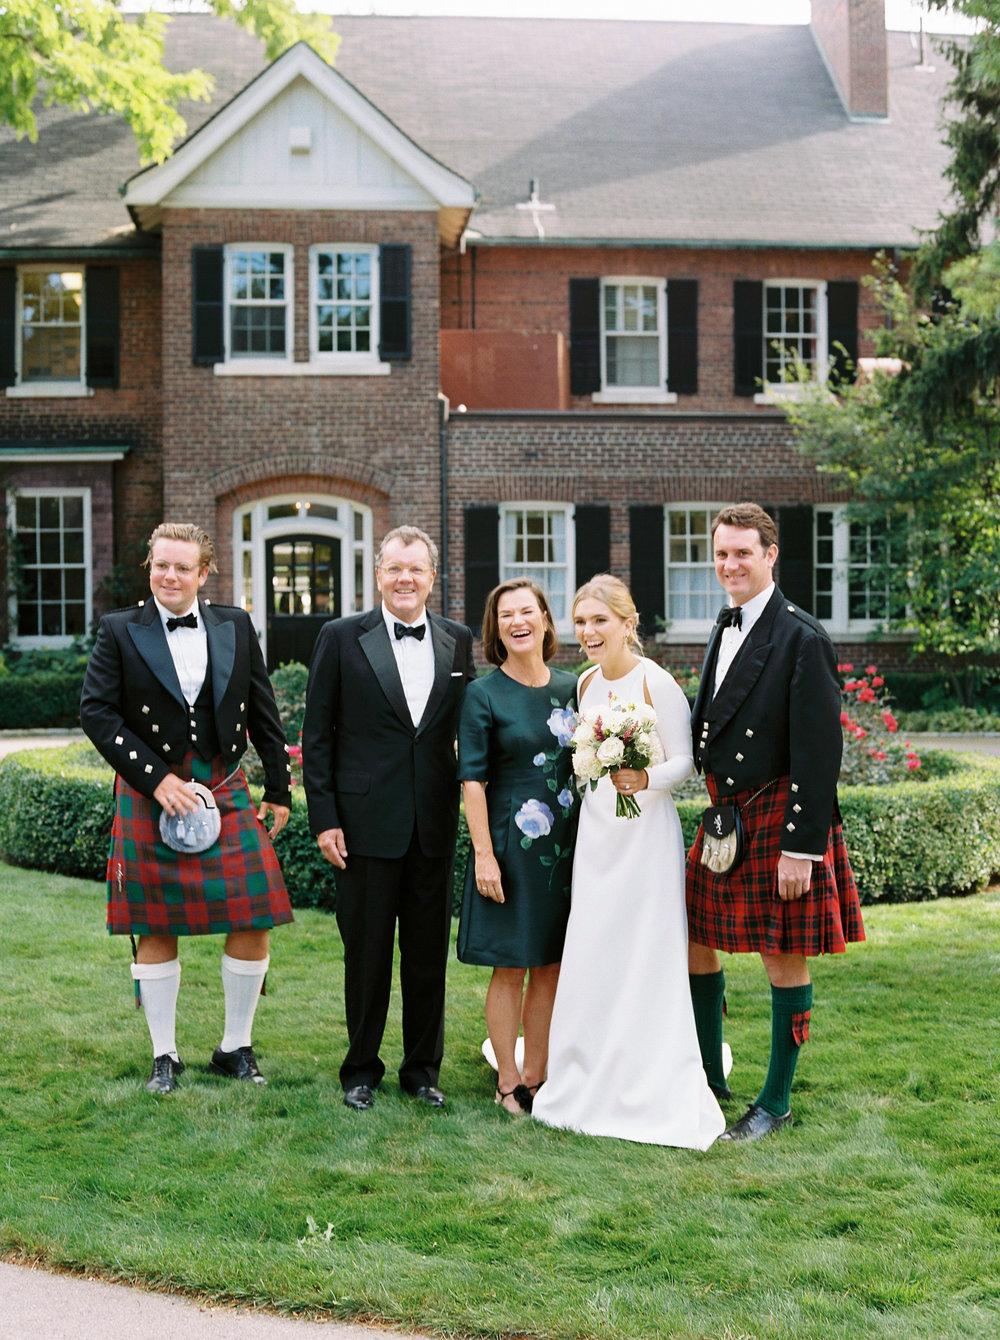 0217-Geneva-Ian-Wedding-Toronto Golf Club-When He Found Her-TorontoPhotographer.jpg